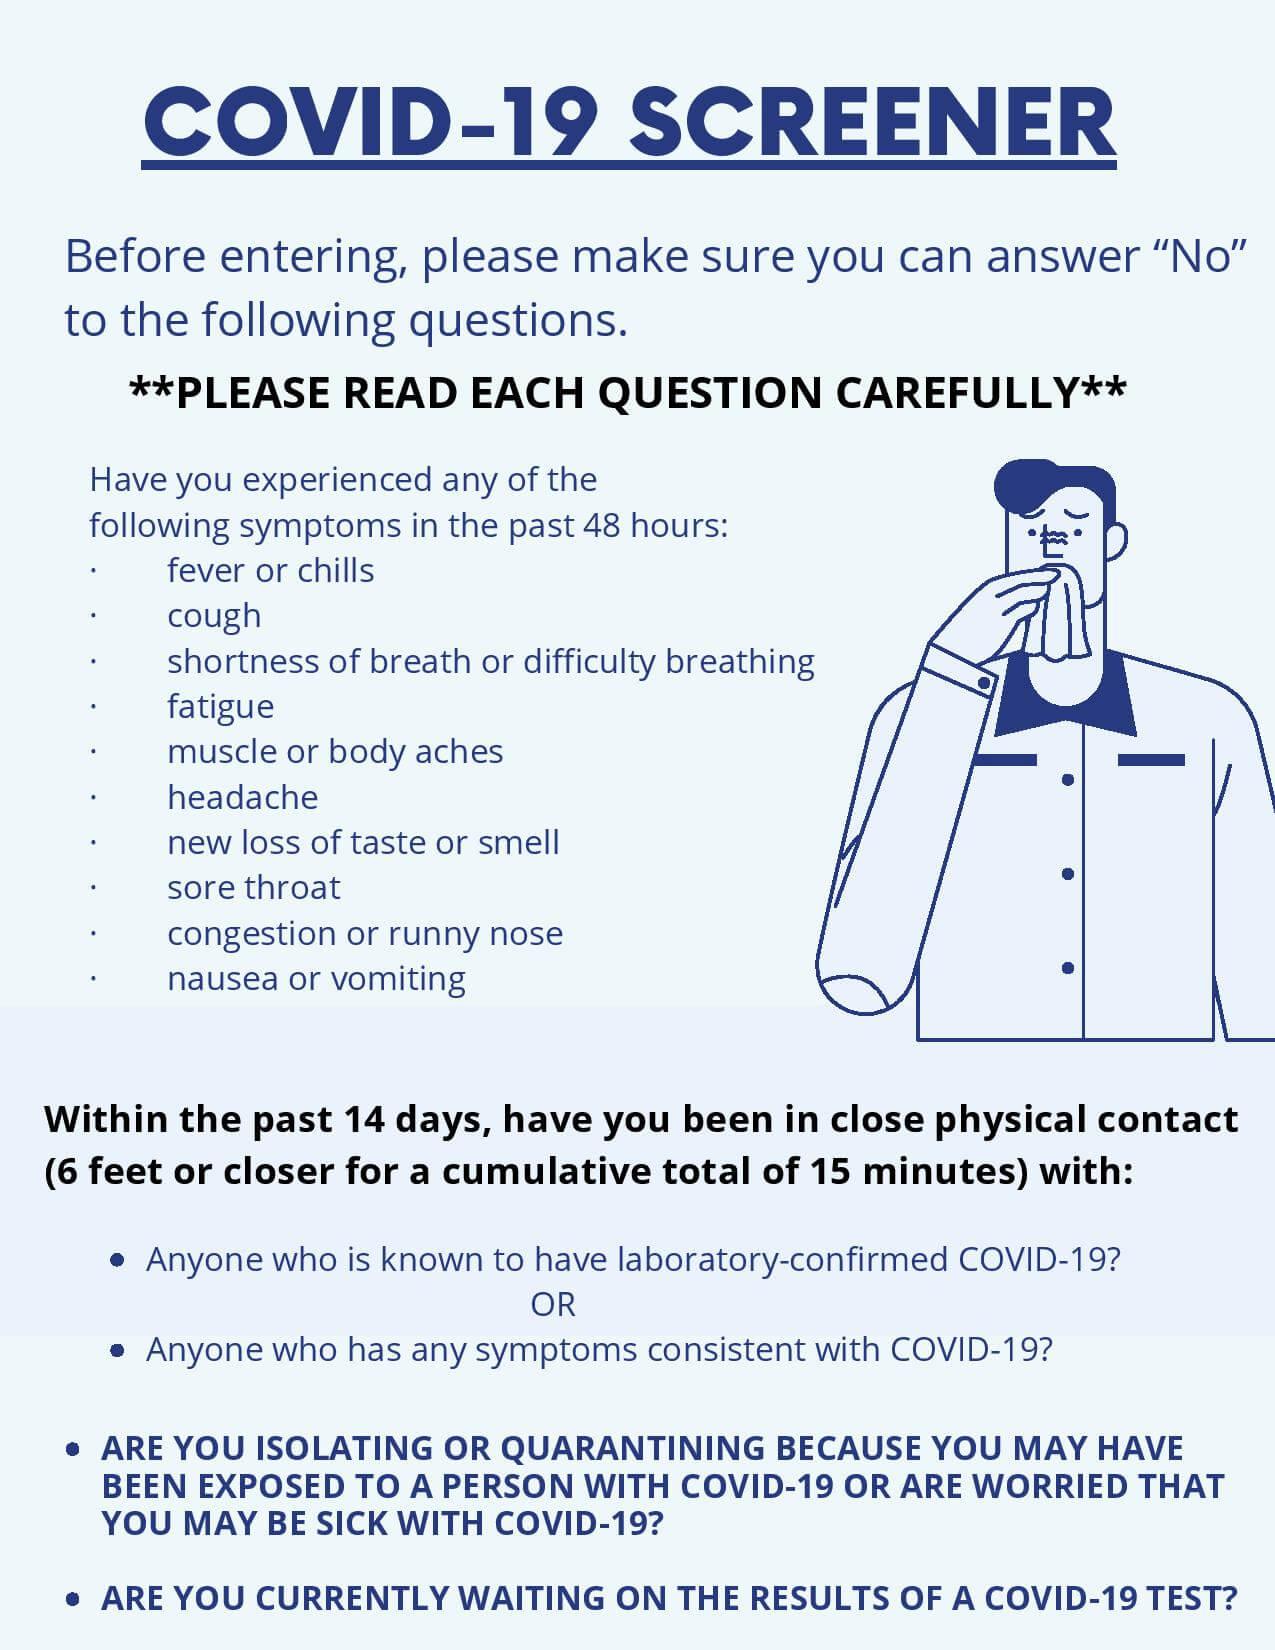 Covid - 19 screener questions